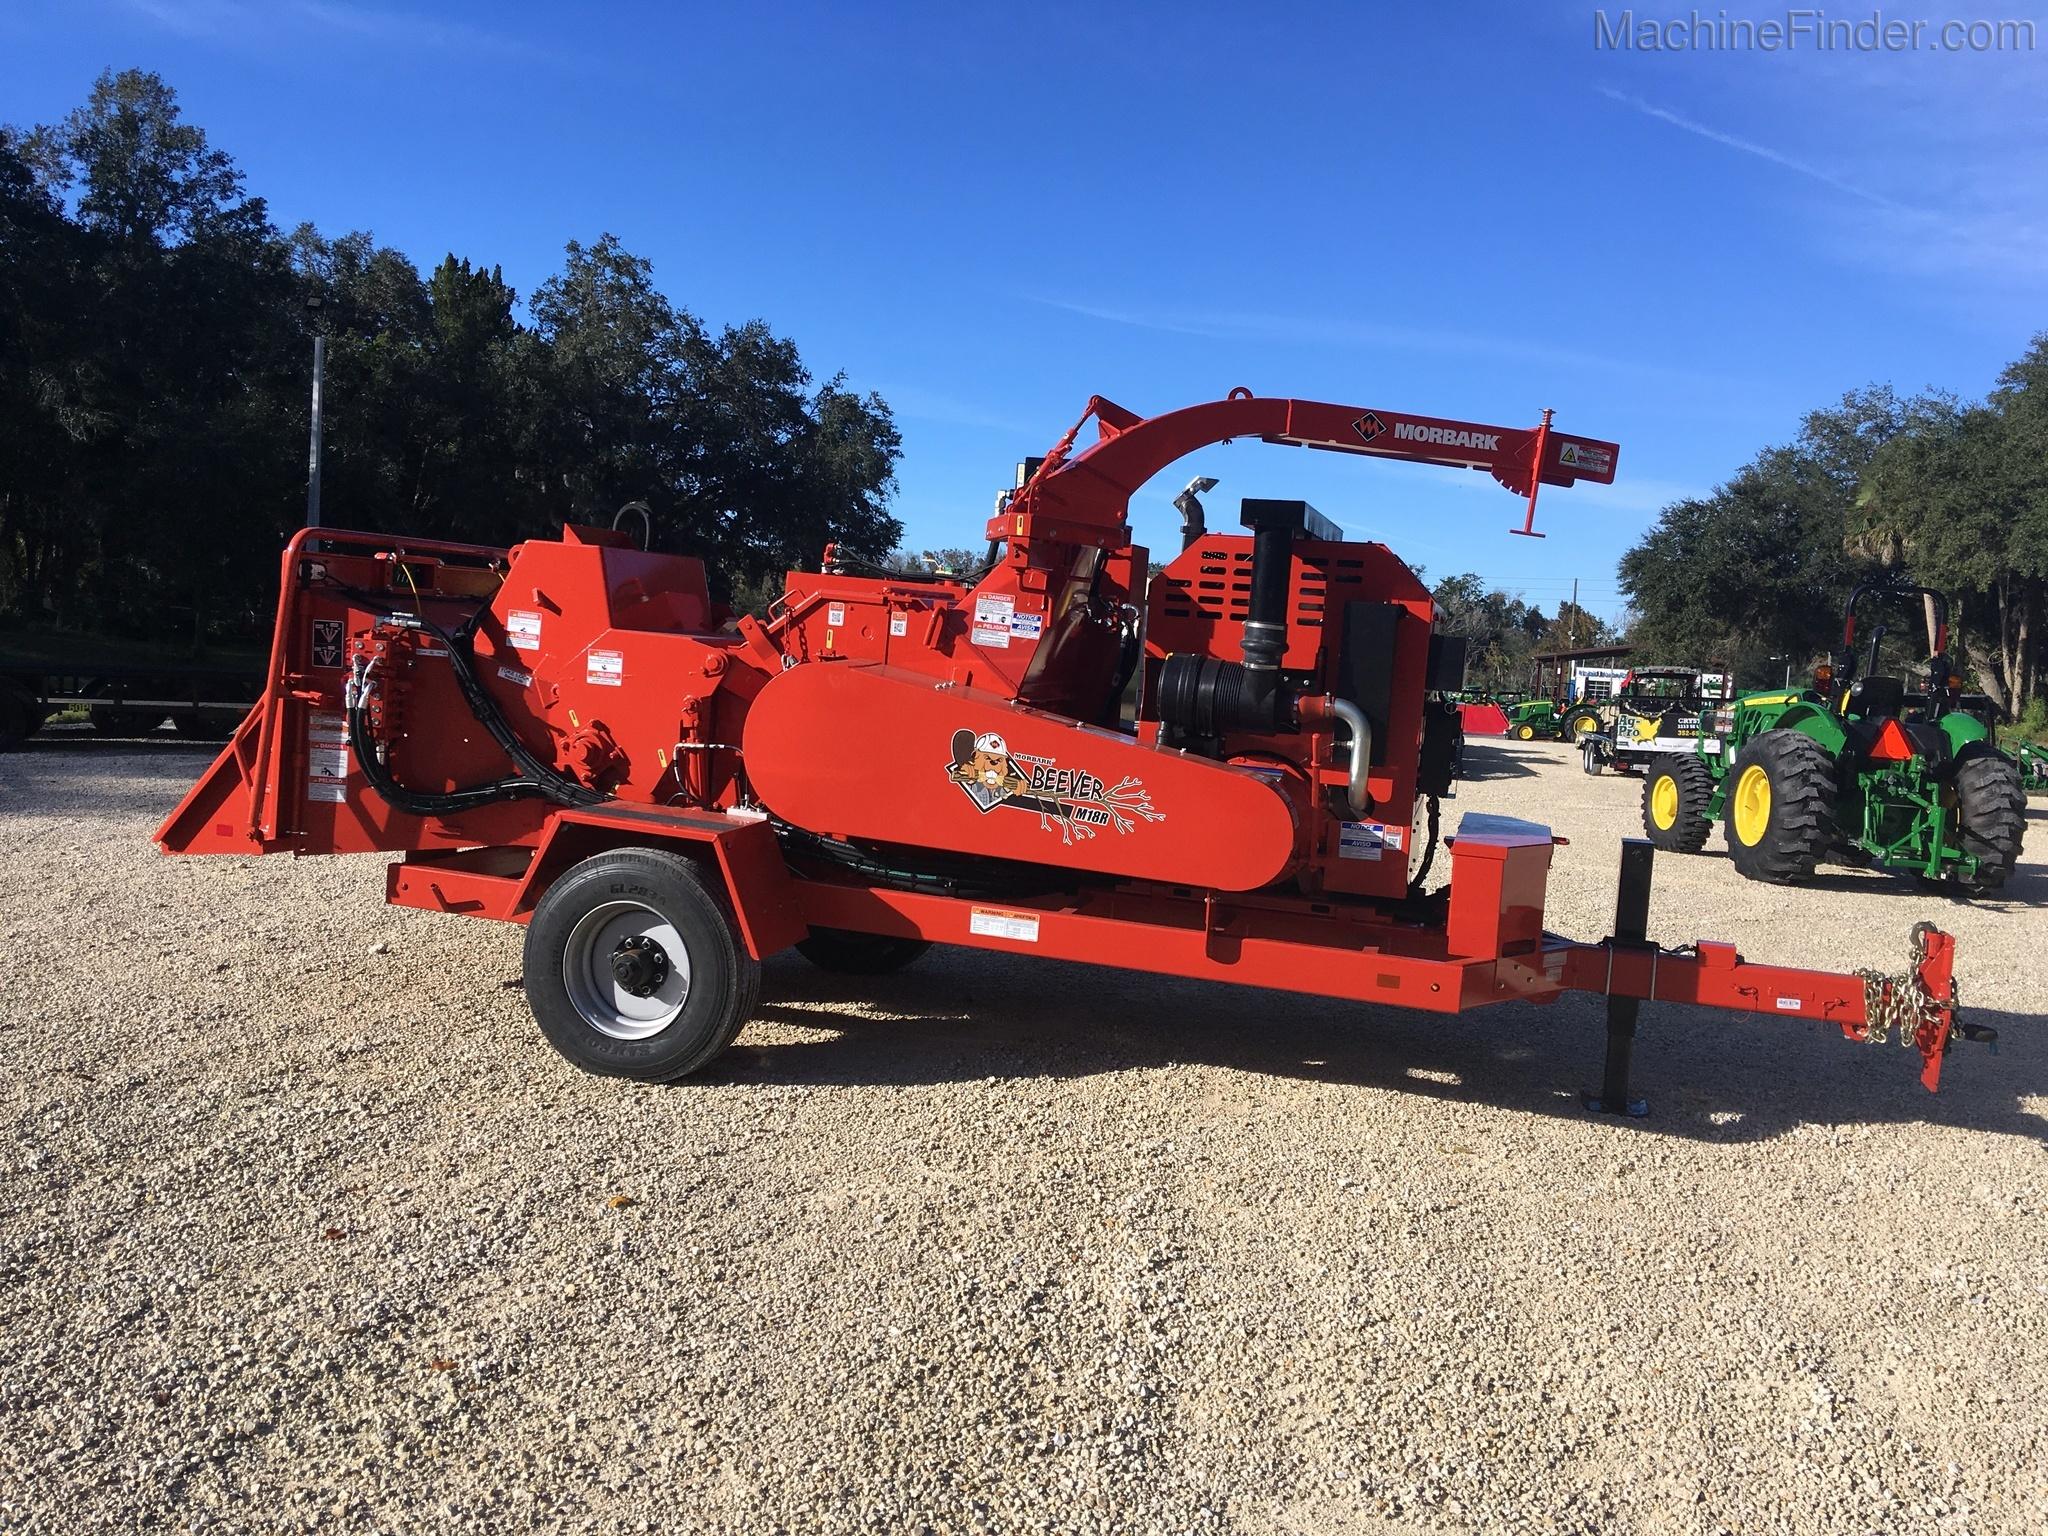 2019 Morbark M18R-SA - Chippers and Grinders - John Deere MachineFinder